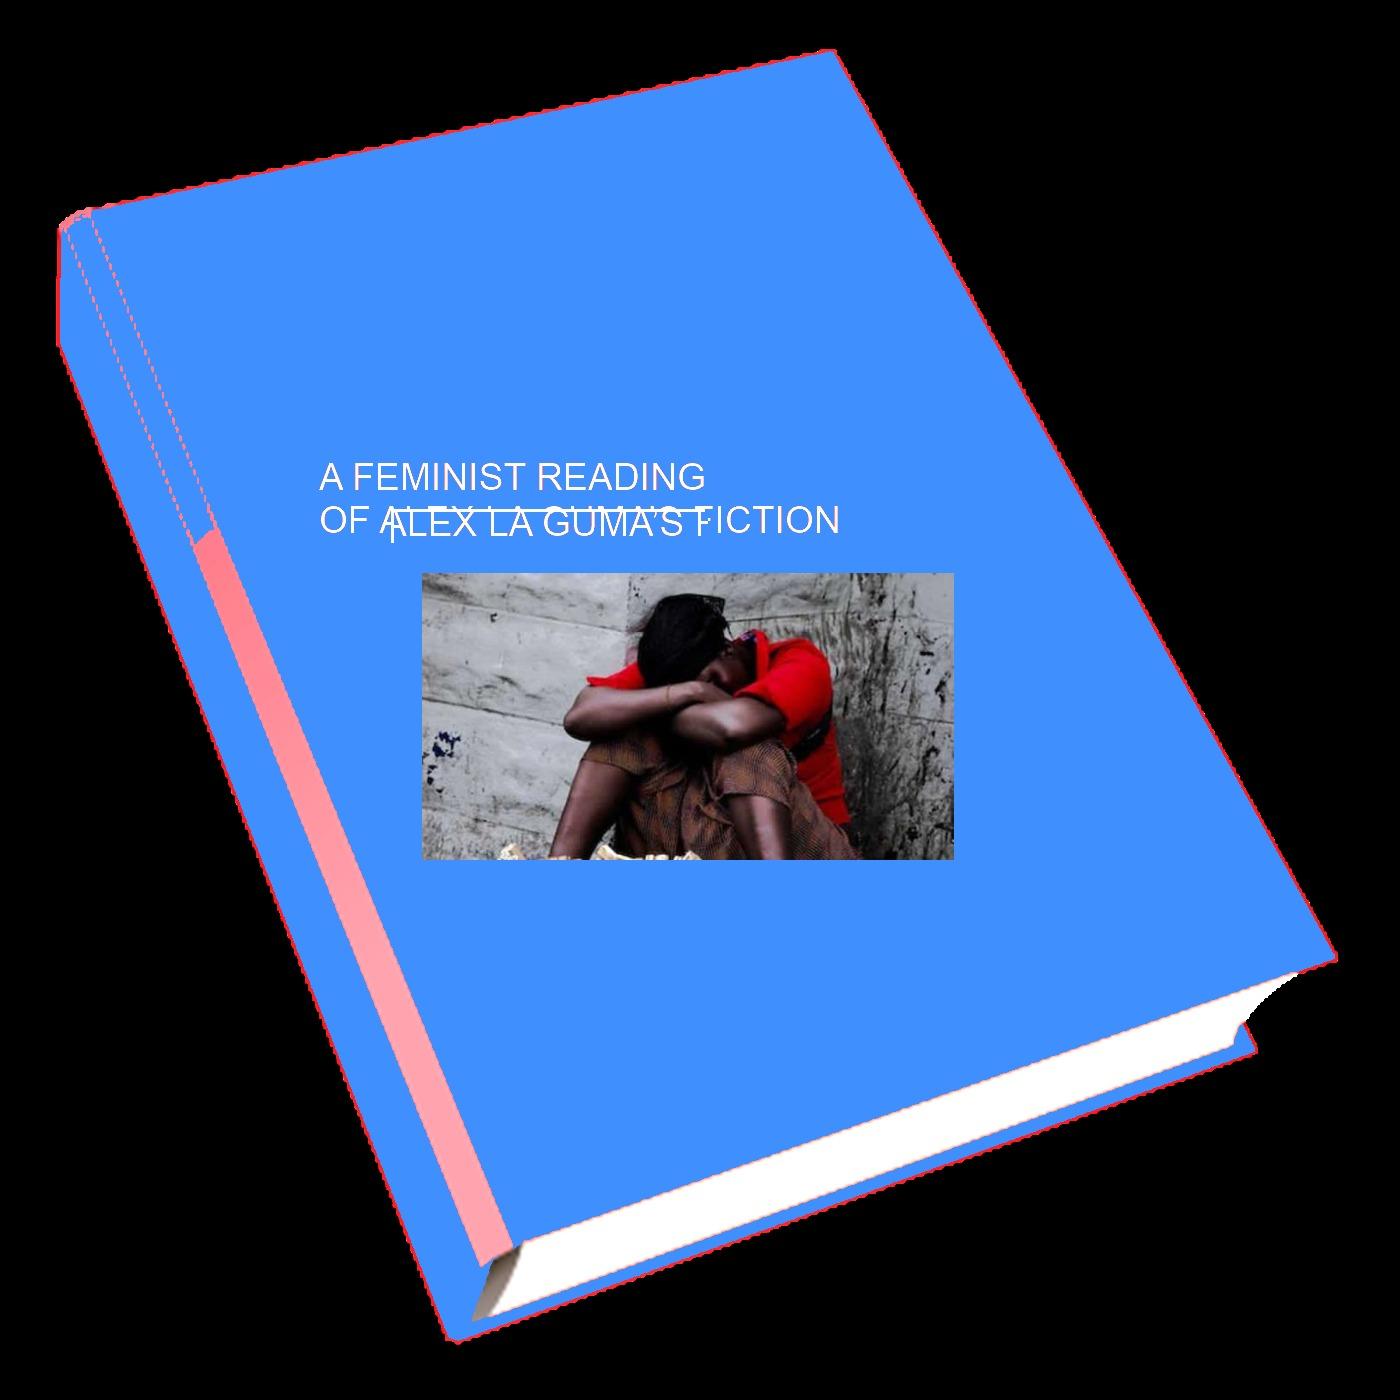 A FEMINIST READING OF ALEX LA GUMA'S FICTION